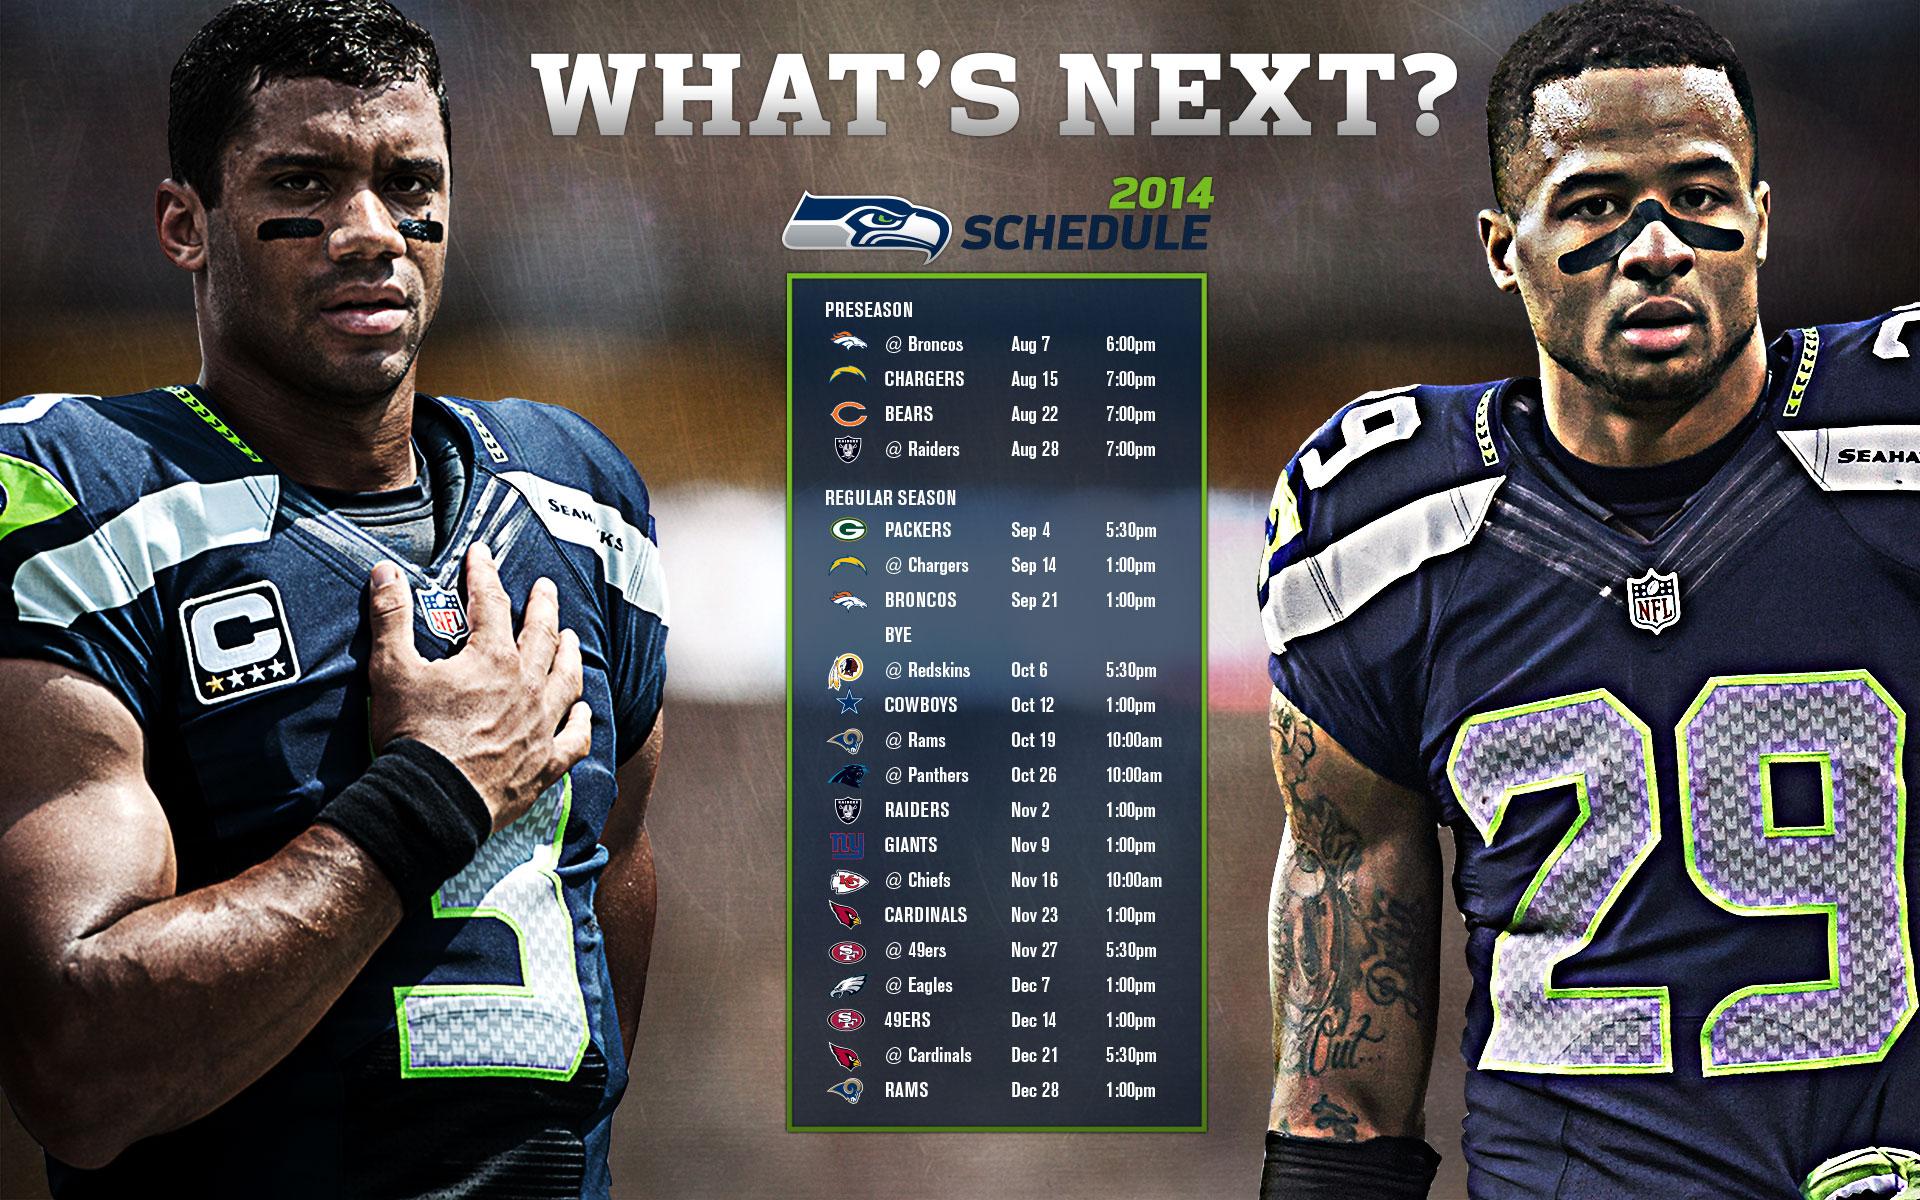 Seahawks 2015 Schedule Wallpaper Specs Price Release Date 1920x1200